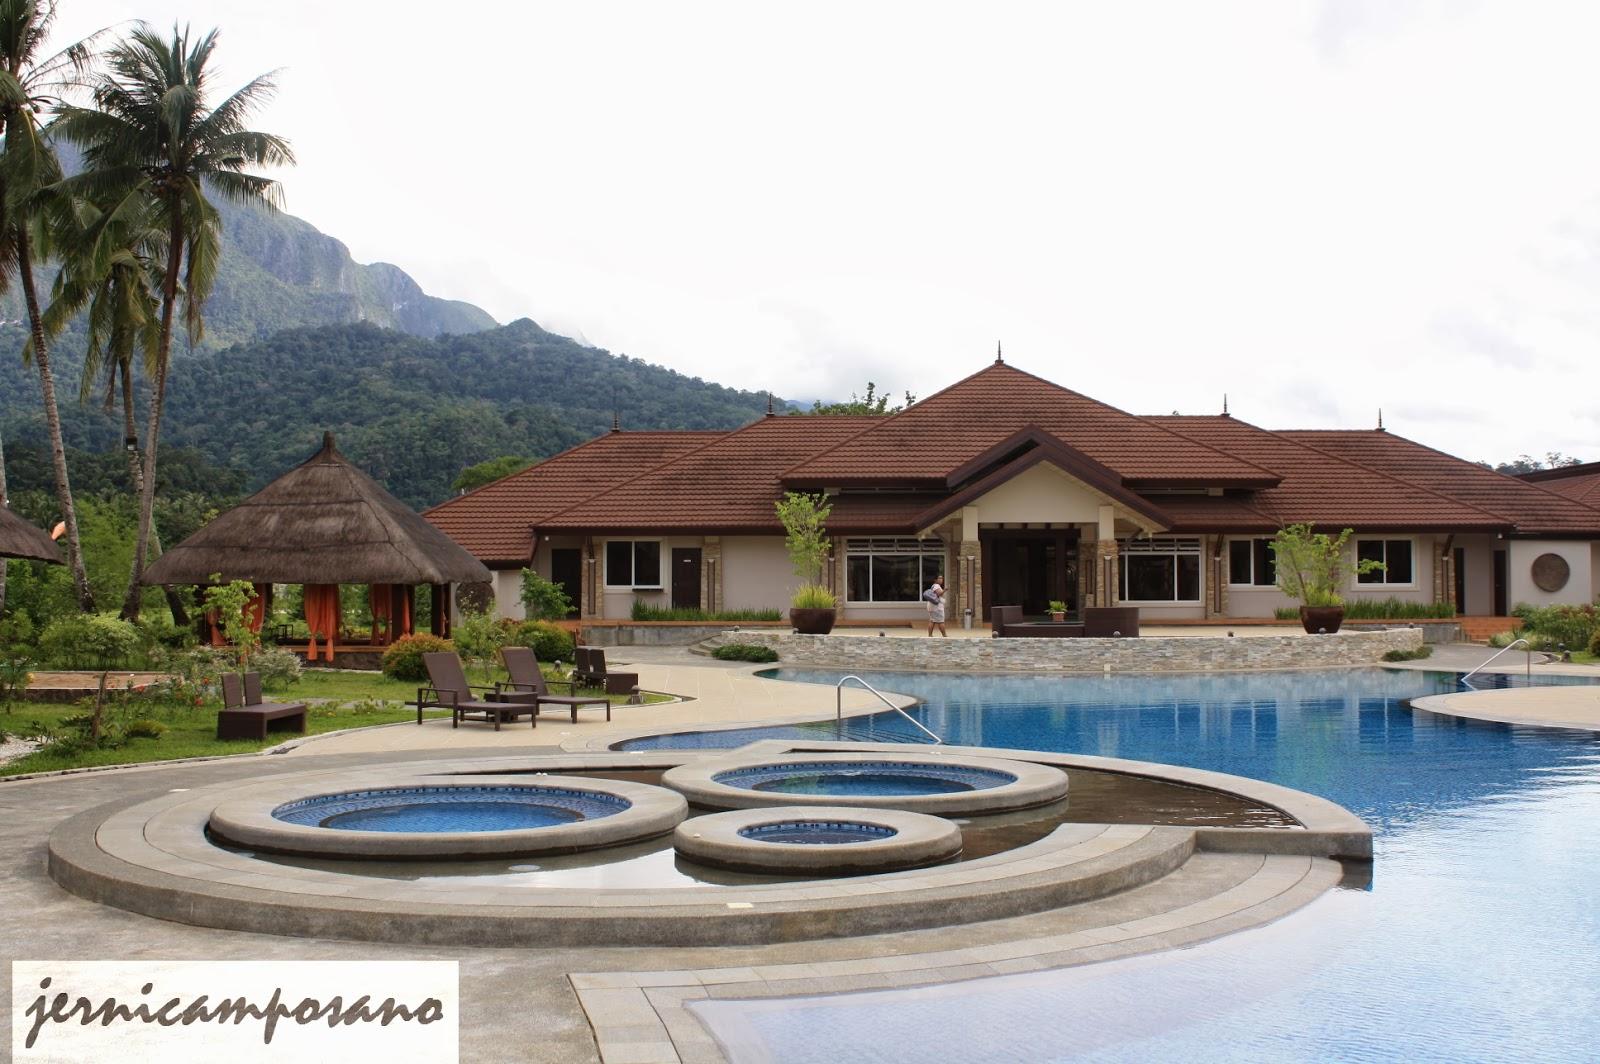 Sheridan beach resort spa jerni camposano - Hotel in puerto princesa with swimming pool ...